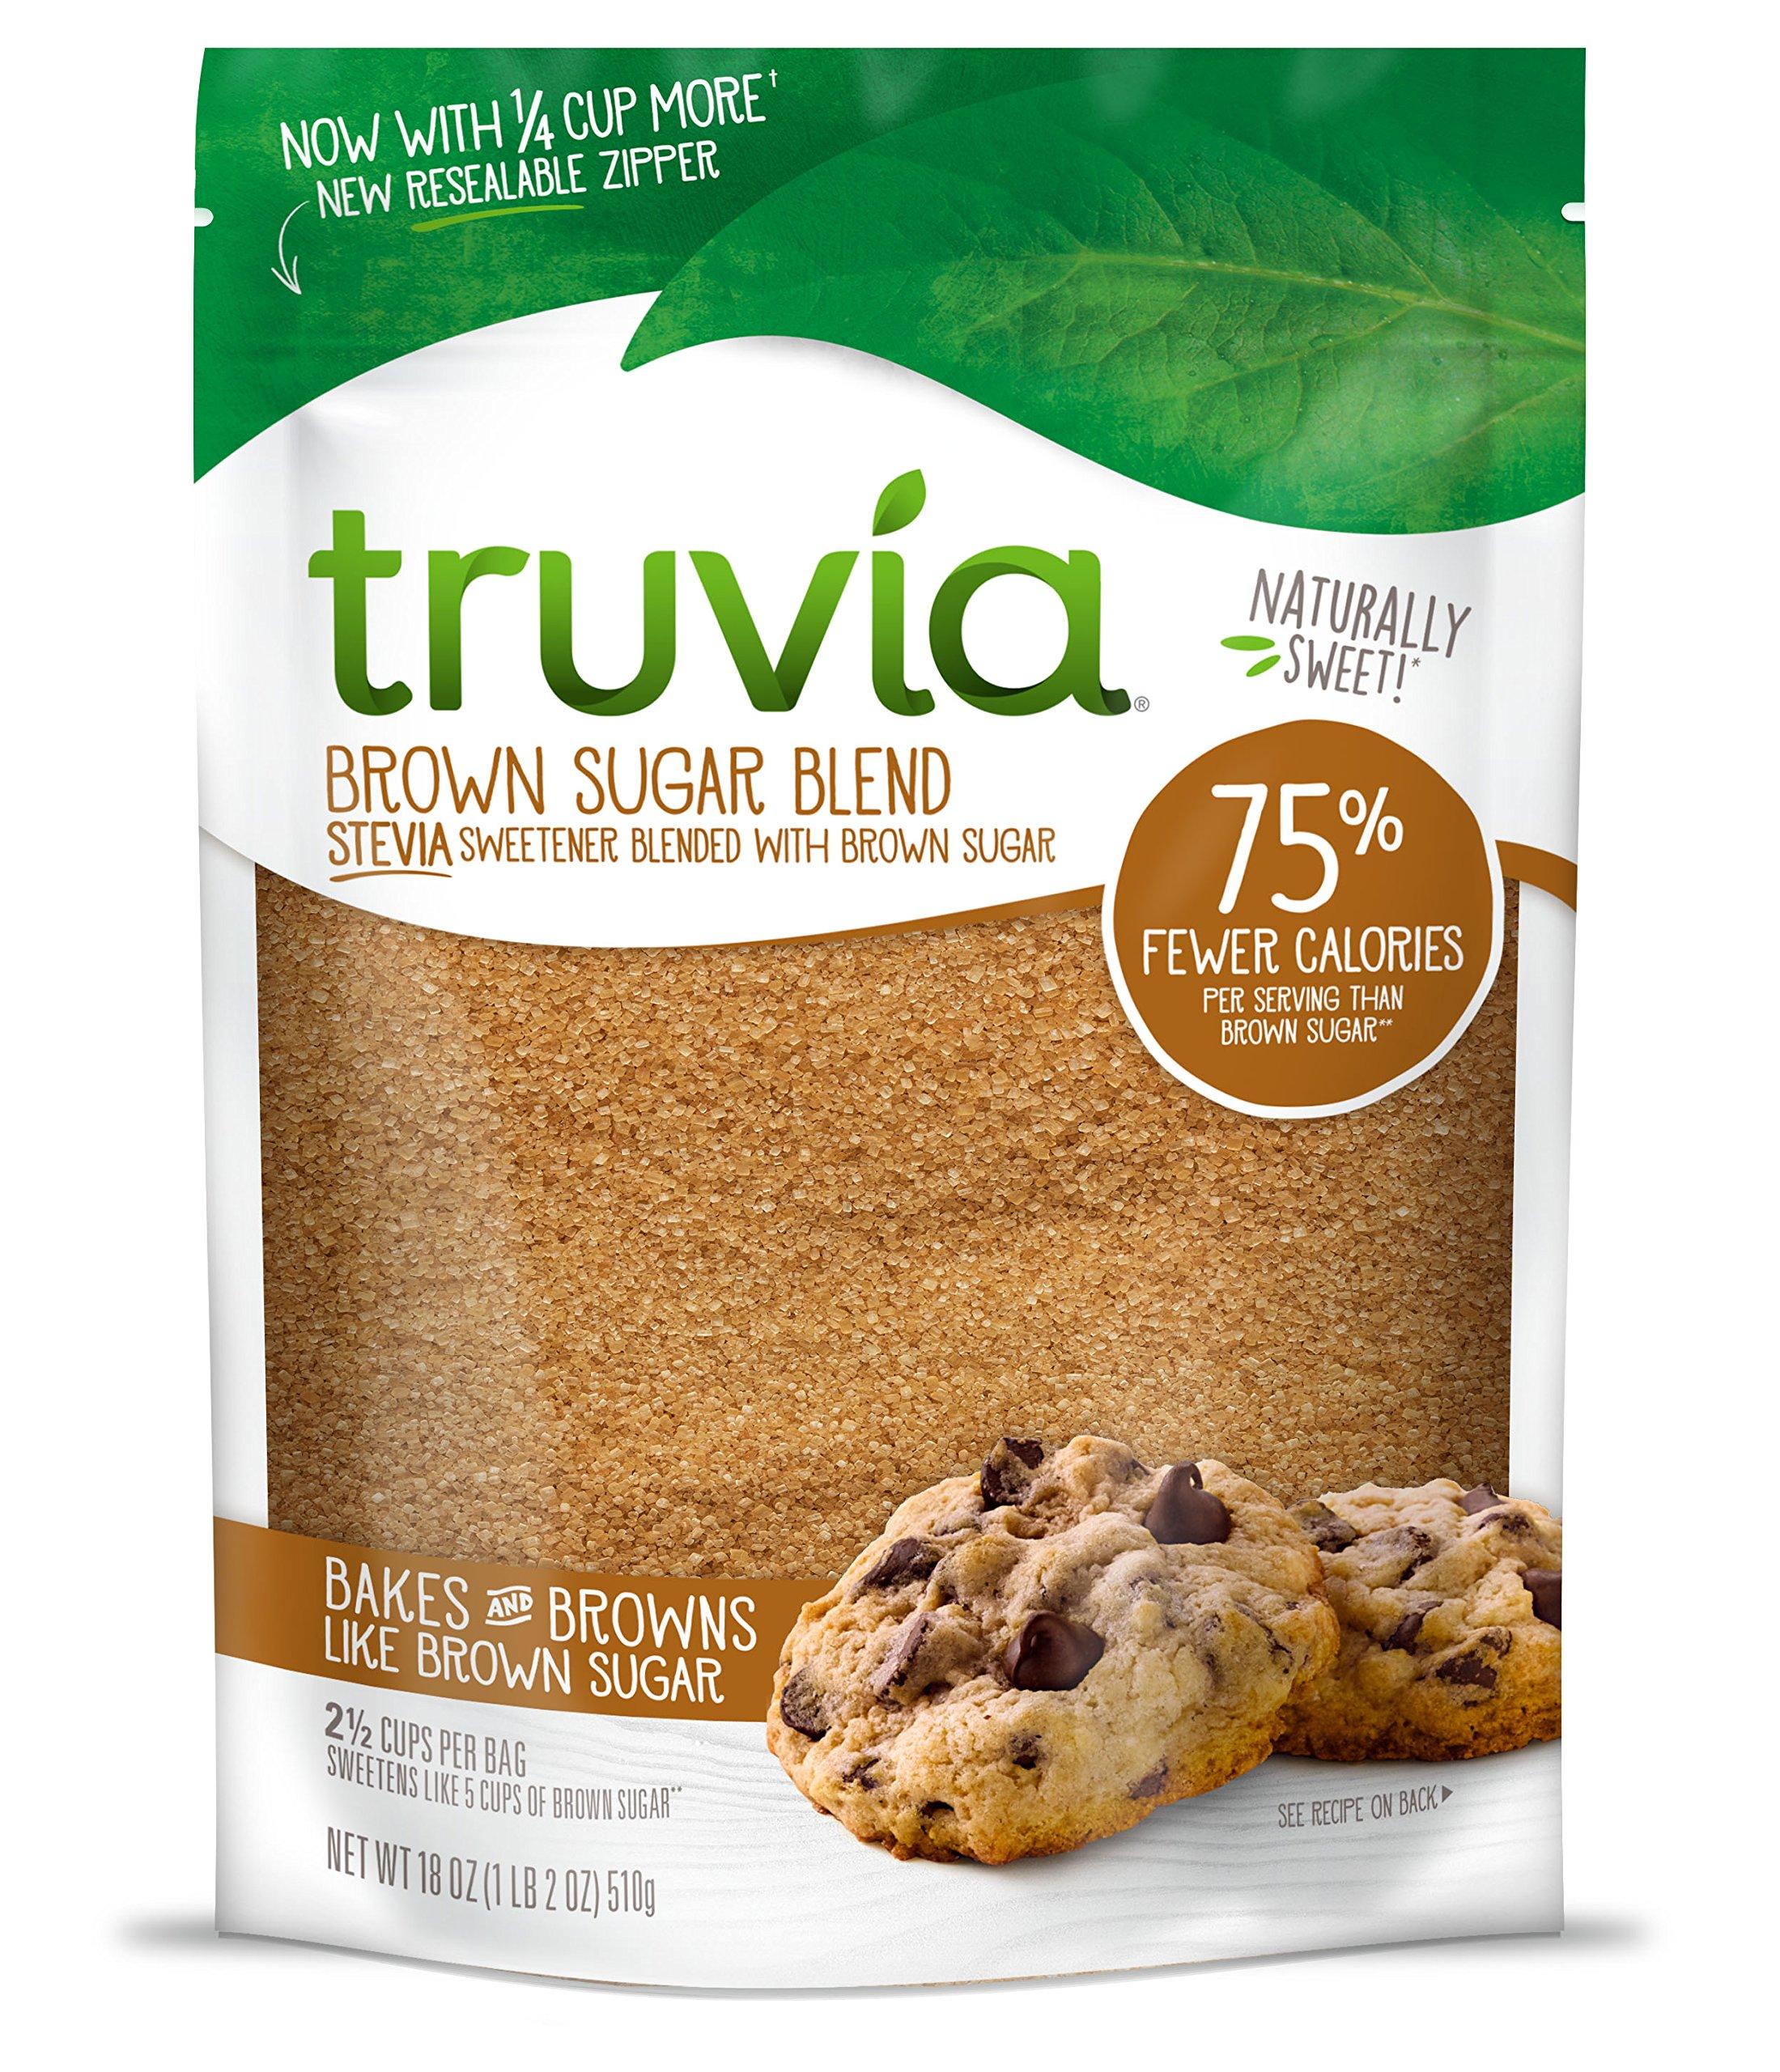 Truvia Brown Sugar Blend, Mix of Natural Stevia Sweetener and Brown Sugar,  18 oz Bag: Amazon.com: Grocery & Gourmet Food